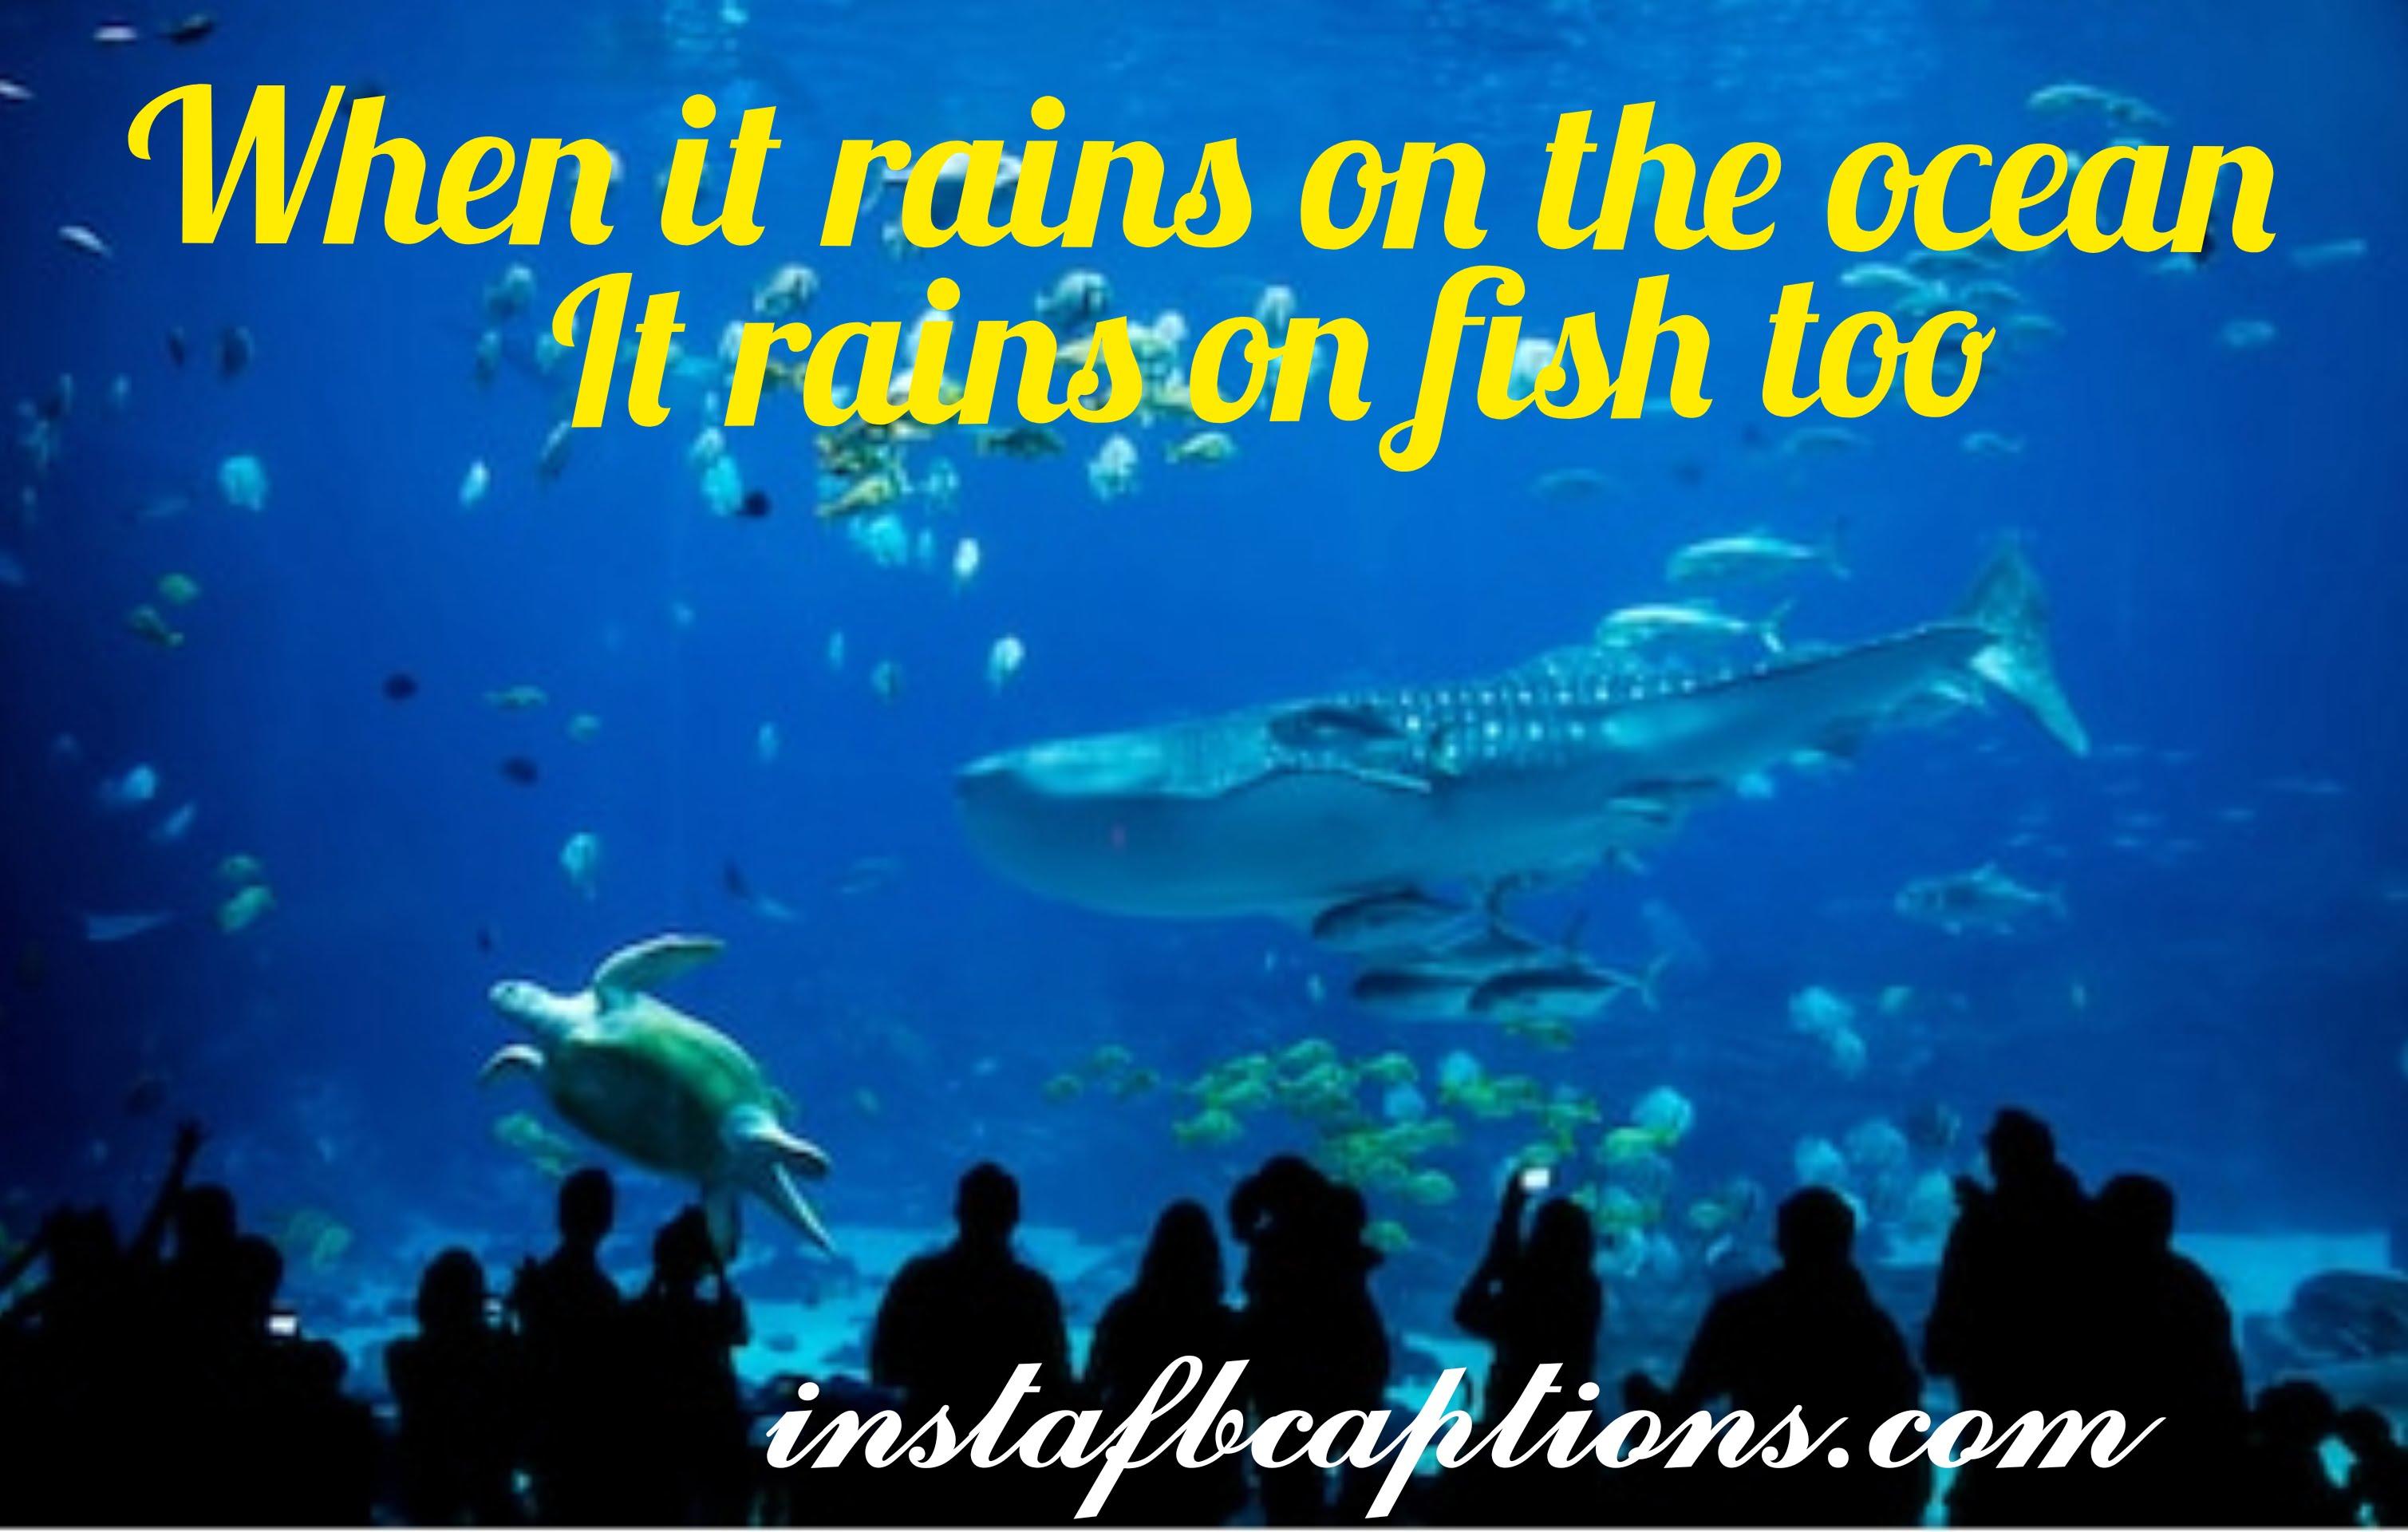 When It Rains In The Ocean It Rains On Fish Too  - when it rains in the ocean it rains on fish too - Aquarium captions for Pet Fish||(cute planted nature)